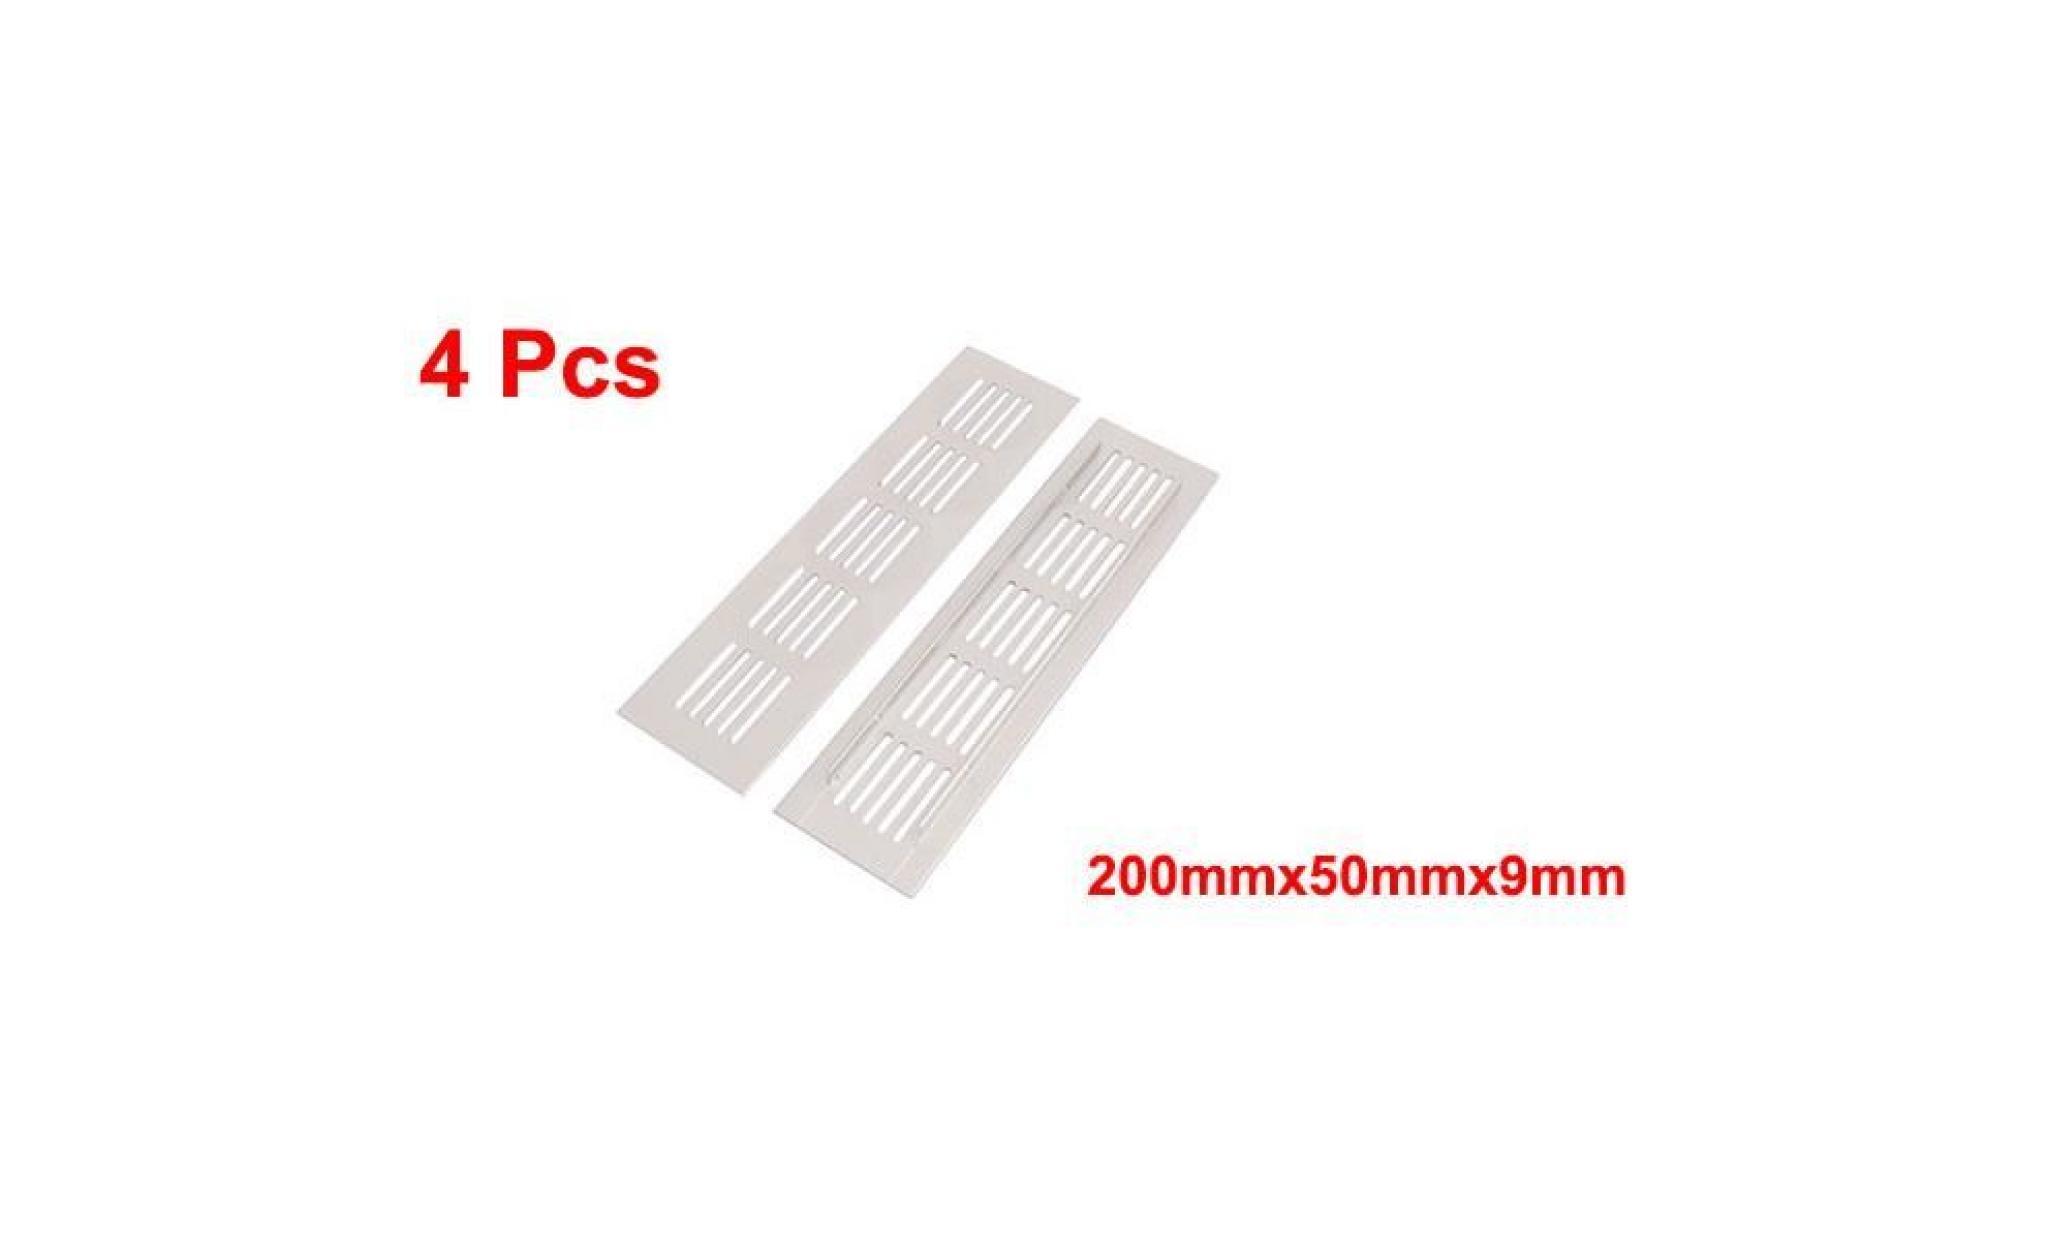 Cabinet Alliage D/'Aluminium Diffuseur 300x80x15mm 4Pcs grille ventilation air